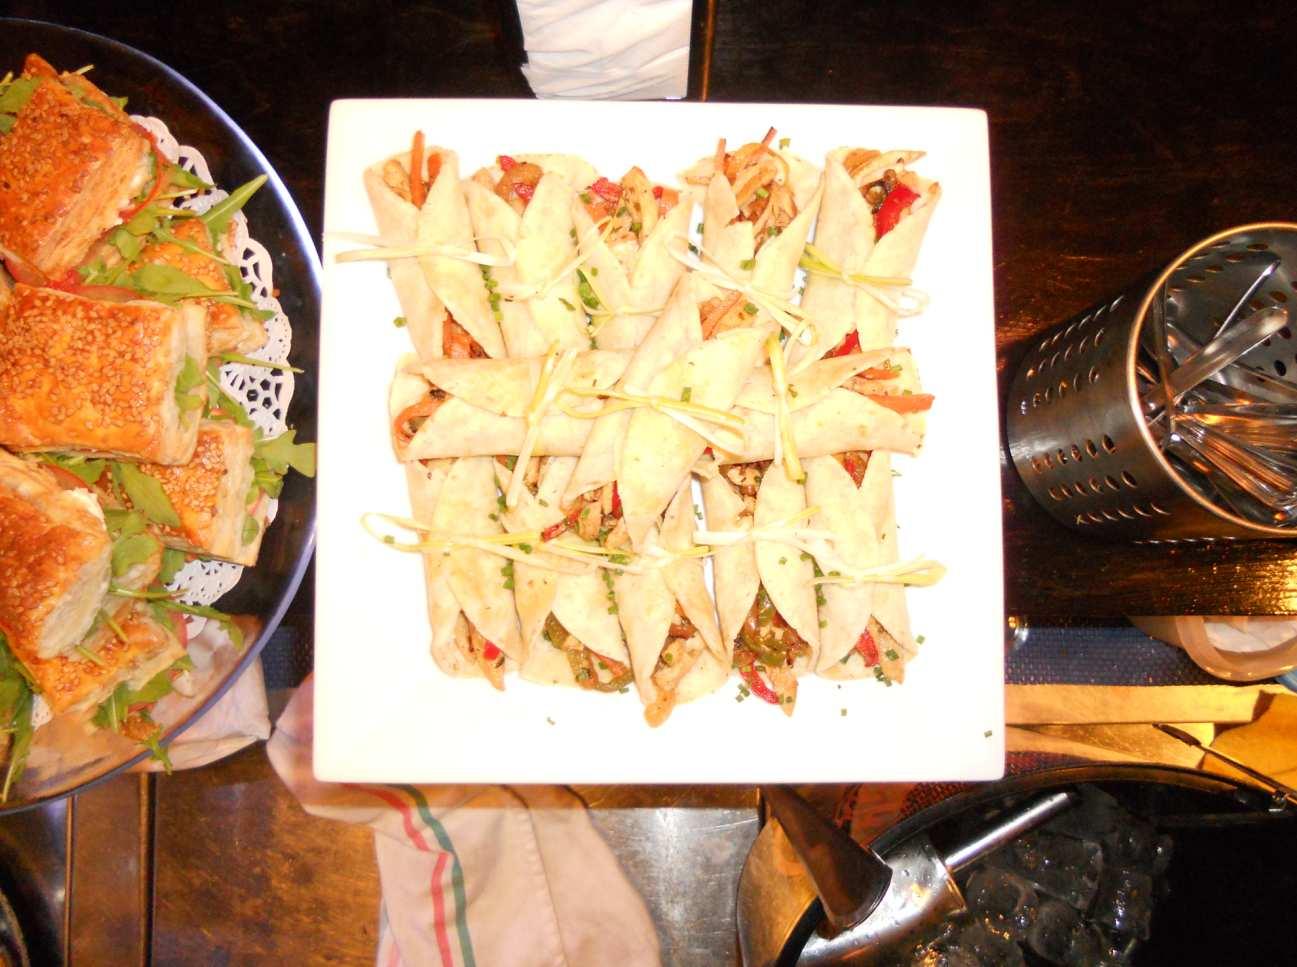 Foto 10 de Cocina vasca en Barcelona | LP Bar